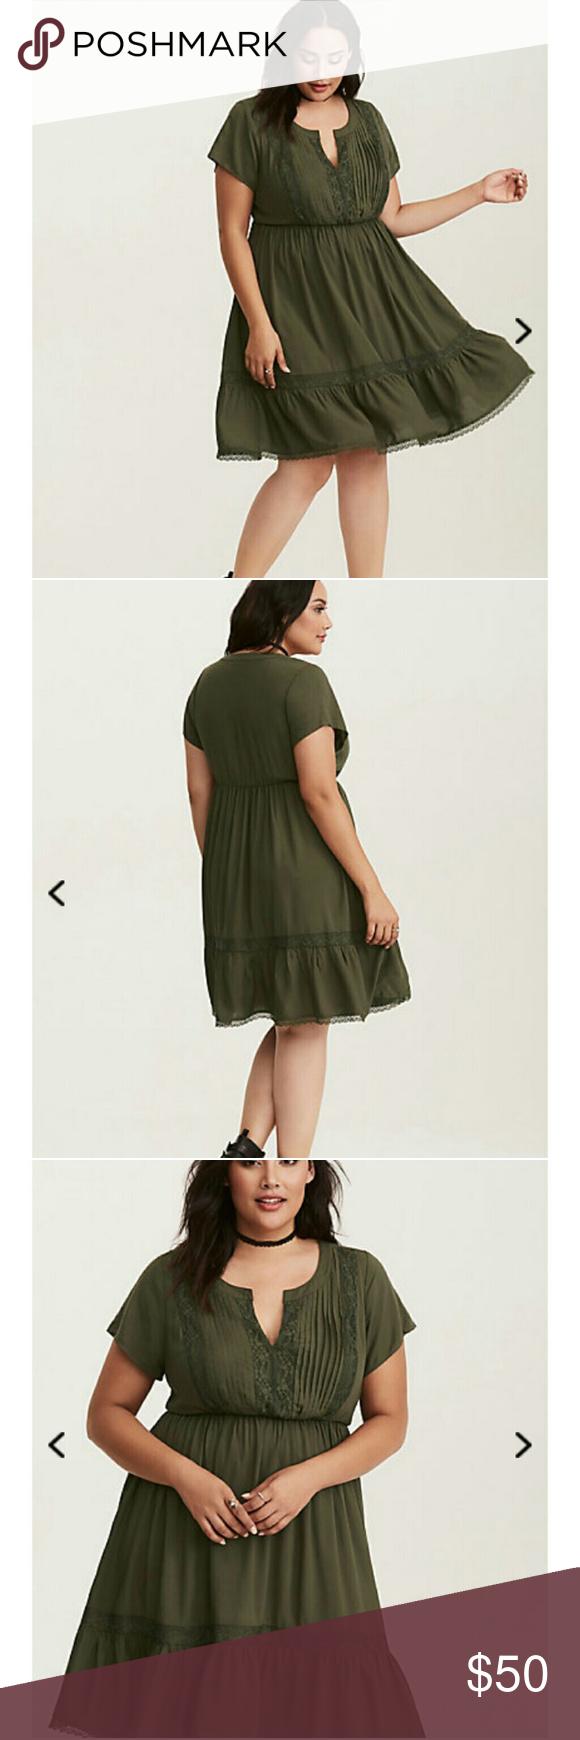 Lace dress torrid  Torrid Olive Green Dress NWT  Olive green dresses Casual fall and